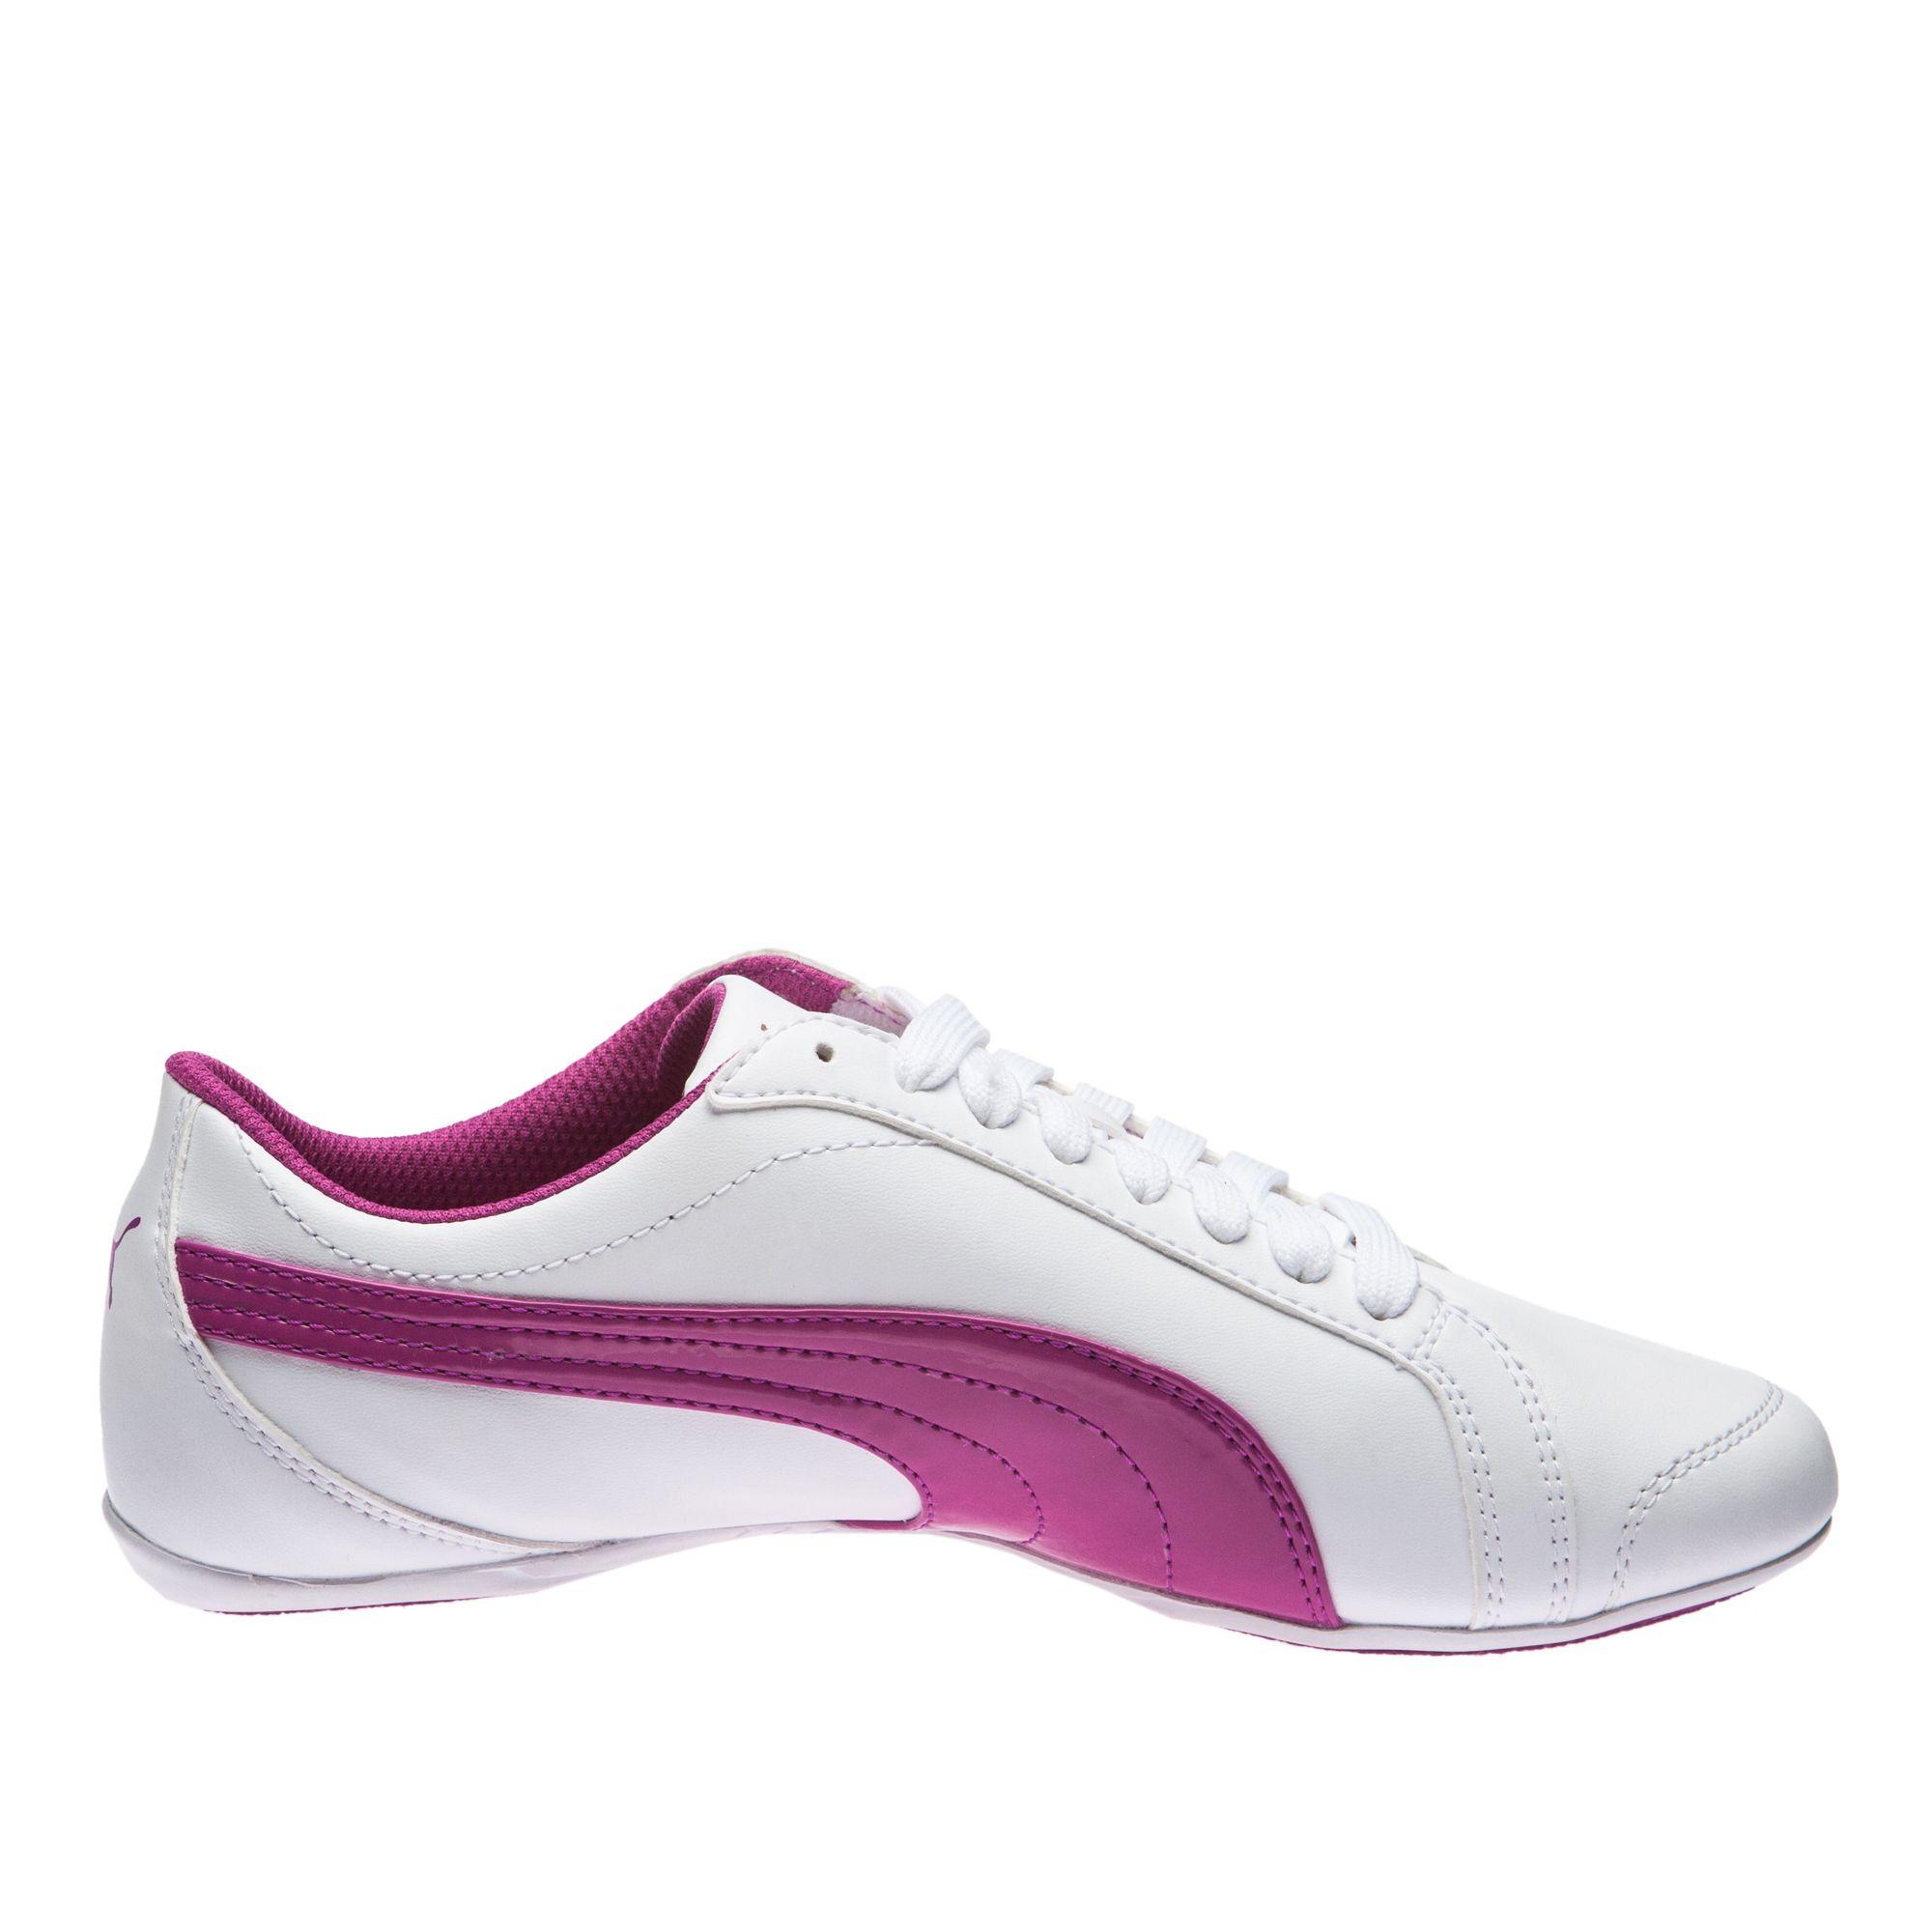 puma janine dance sneaker schuhe sneakers modern sport. Black Bedroom Furniture Sets. Home Design Ideas